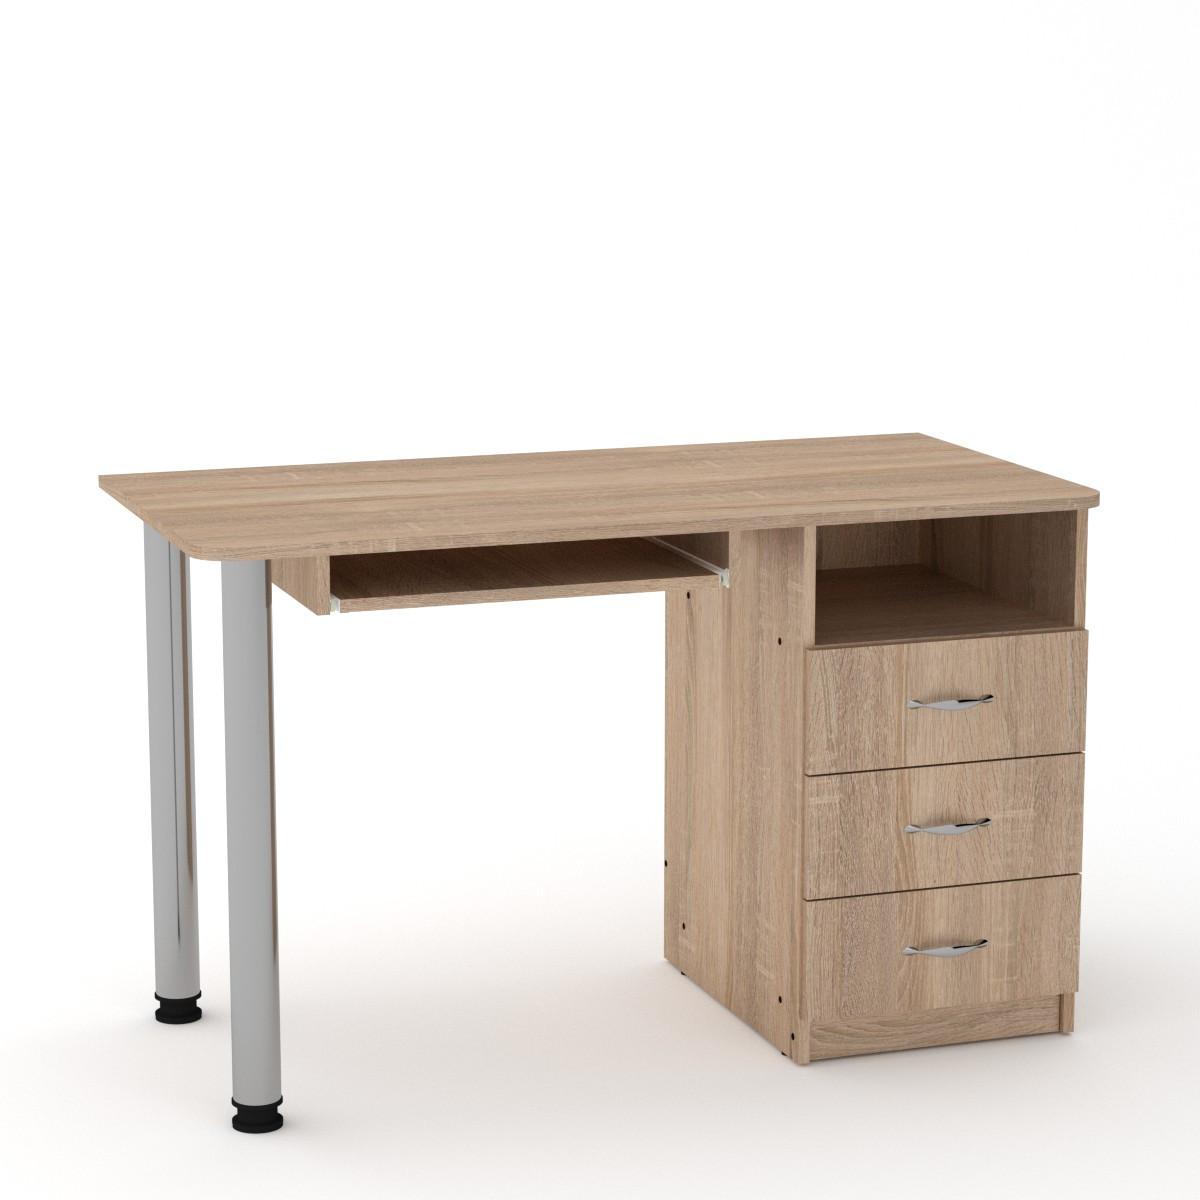 Стол письменный СКМ-9 дуб сонома Компанит (120х60х74 см)